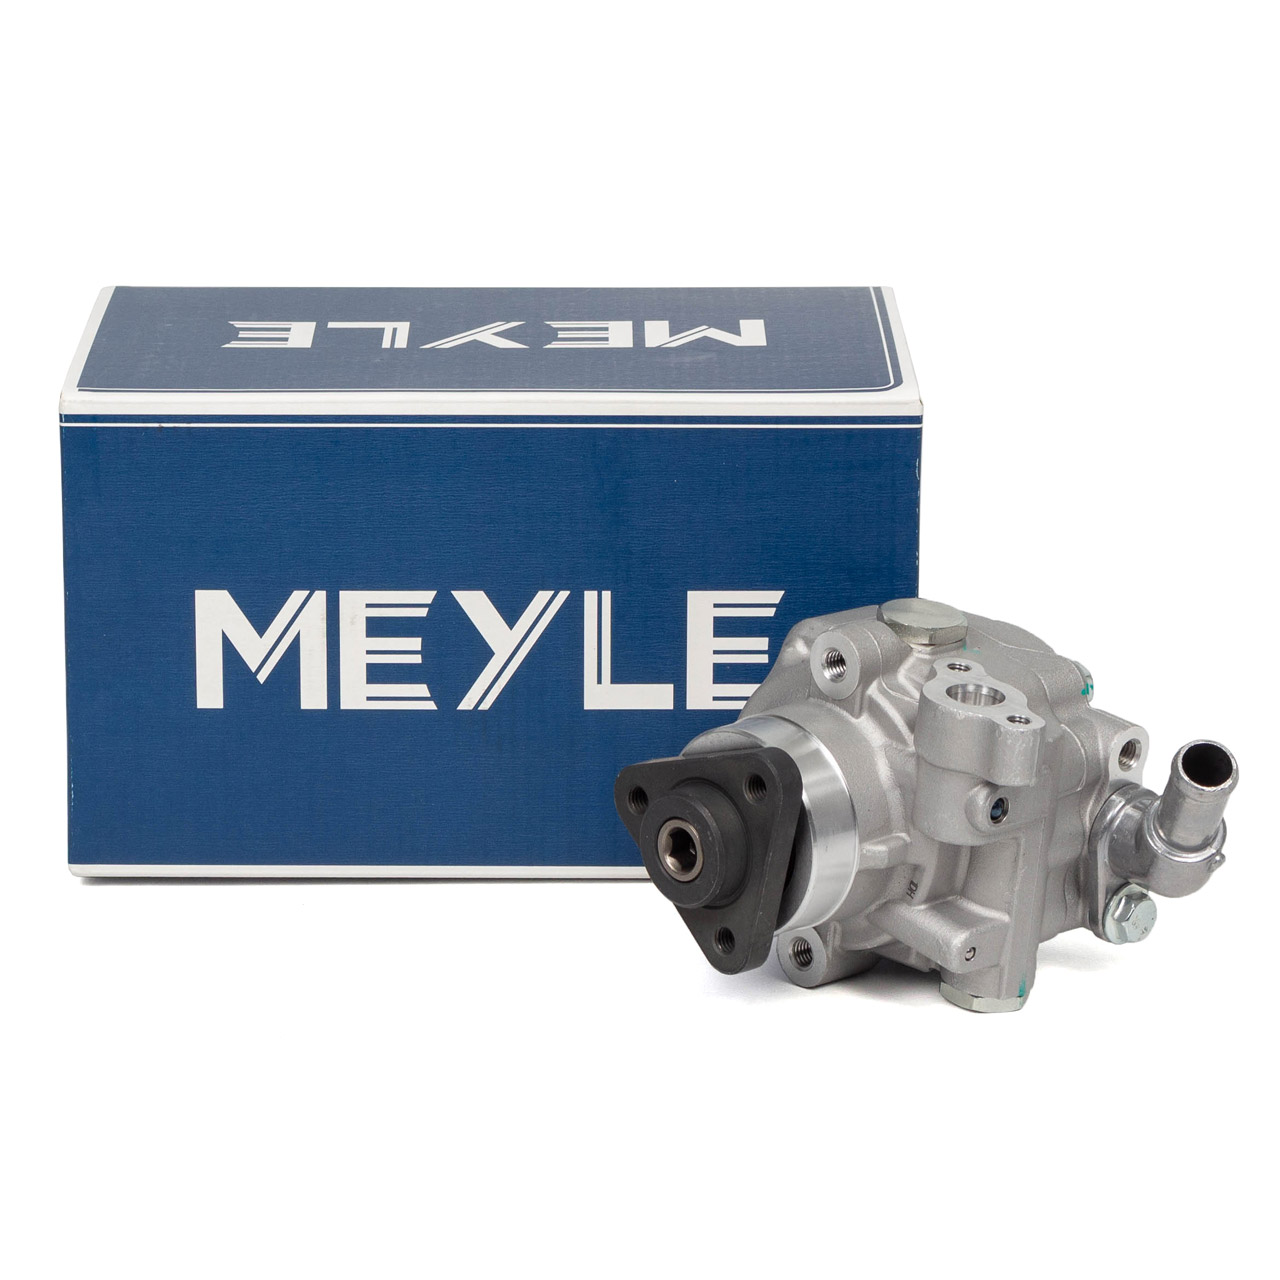 MEYLE 1146310039 Hydraulikpumpe Pumpe VW Transporter T5 T6 Amarok 2.0 TDI BiTDI 2H0422154A